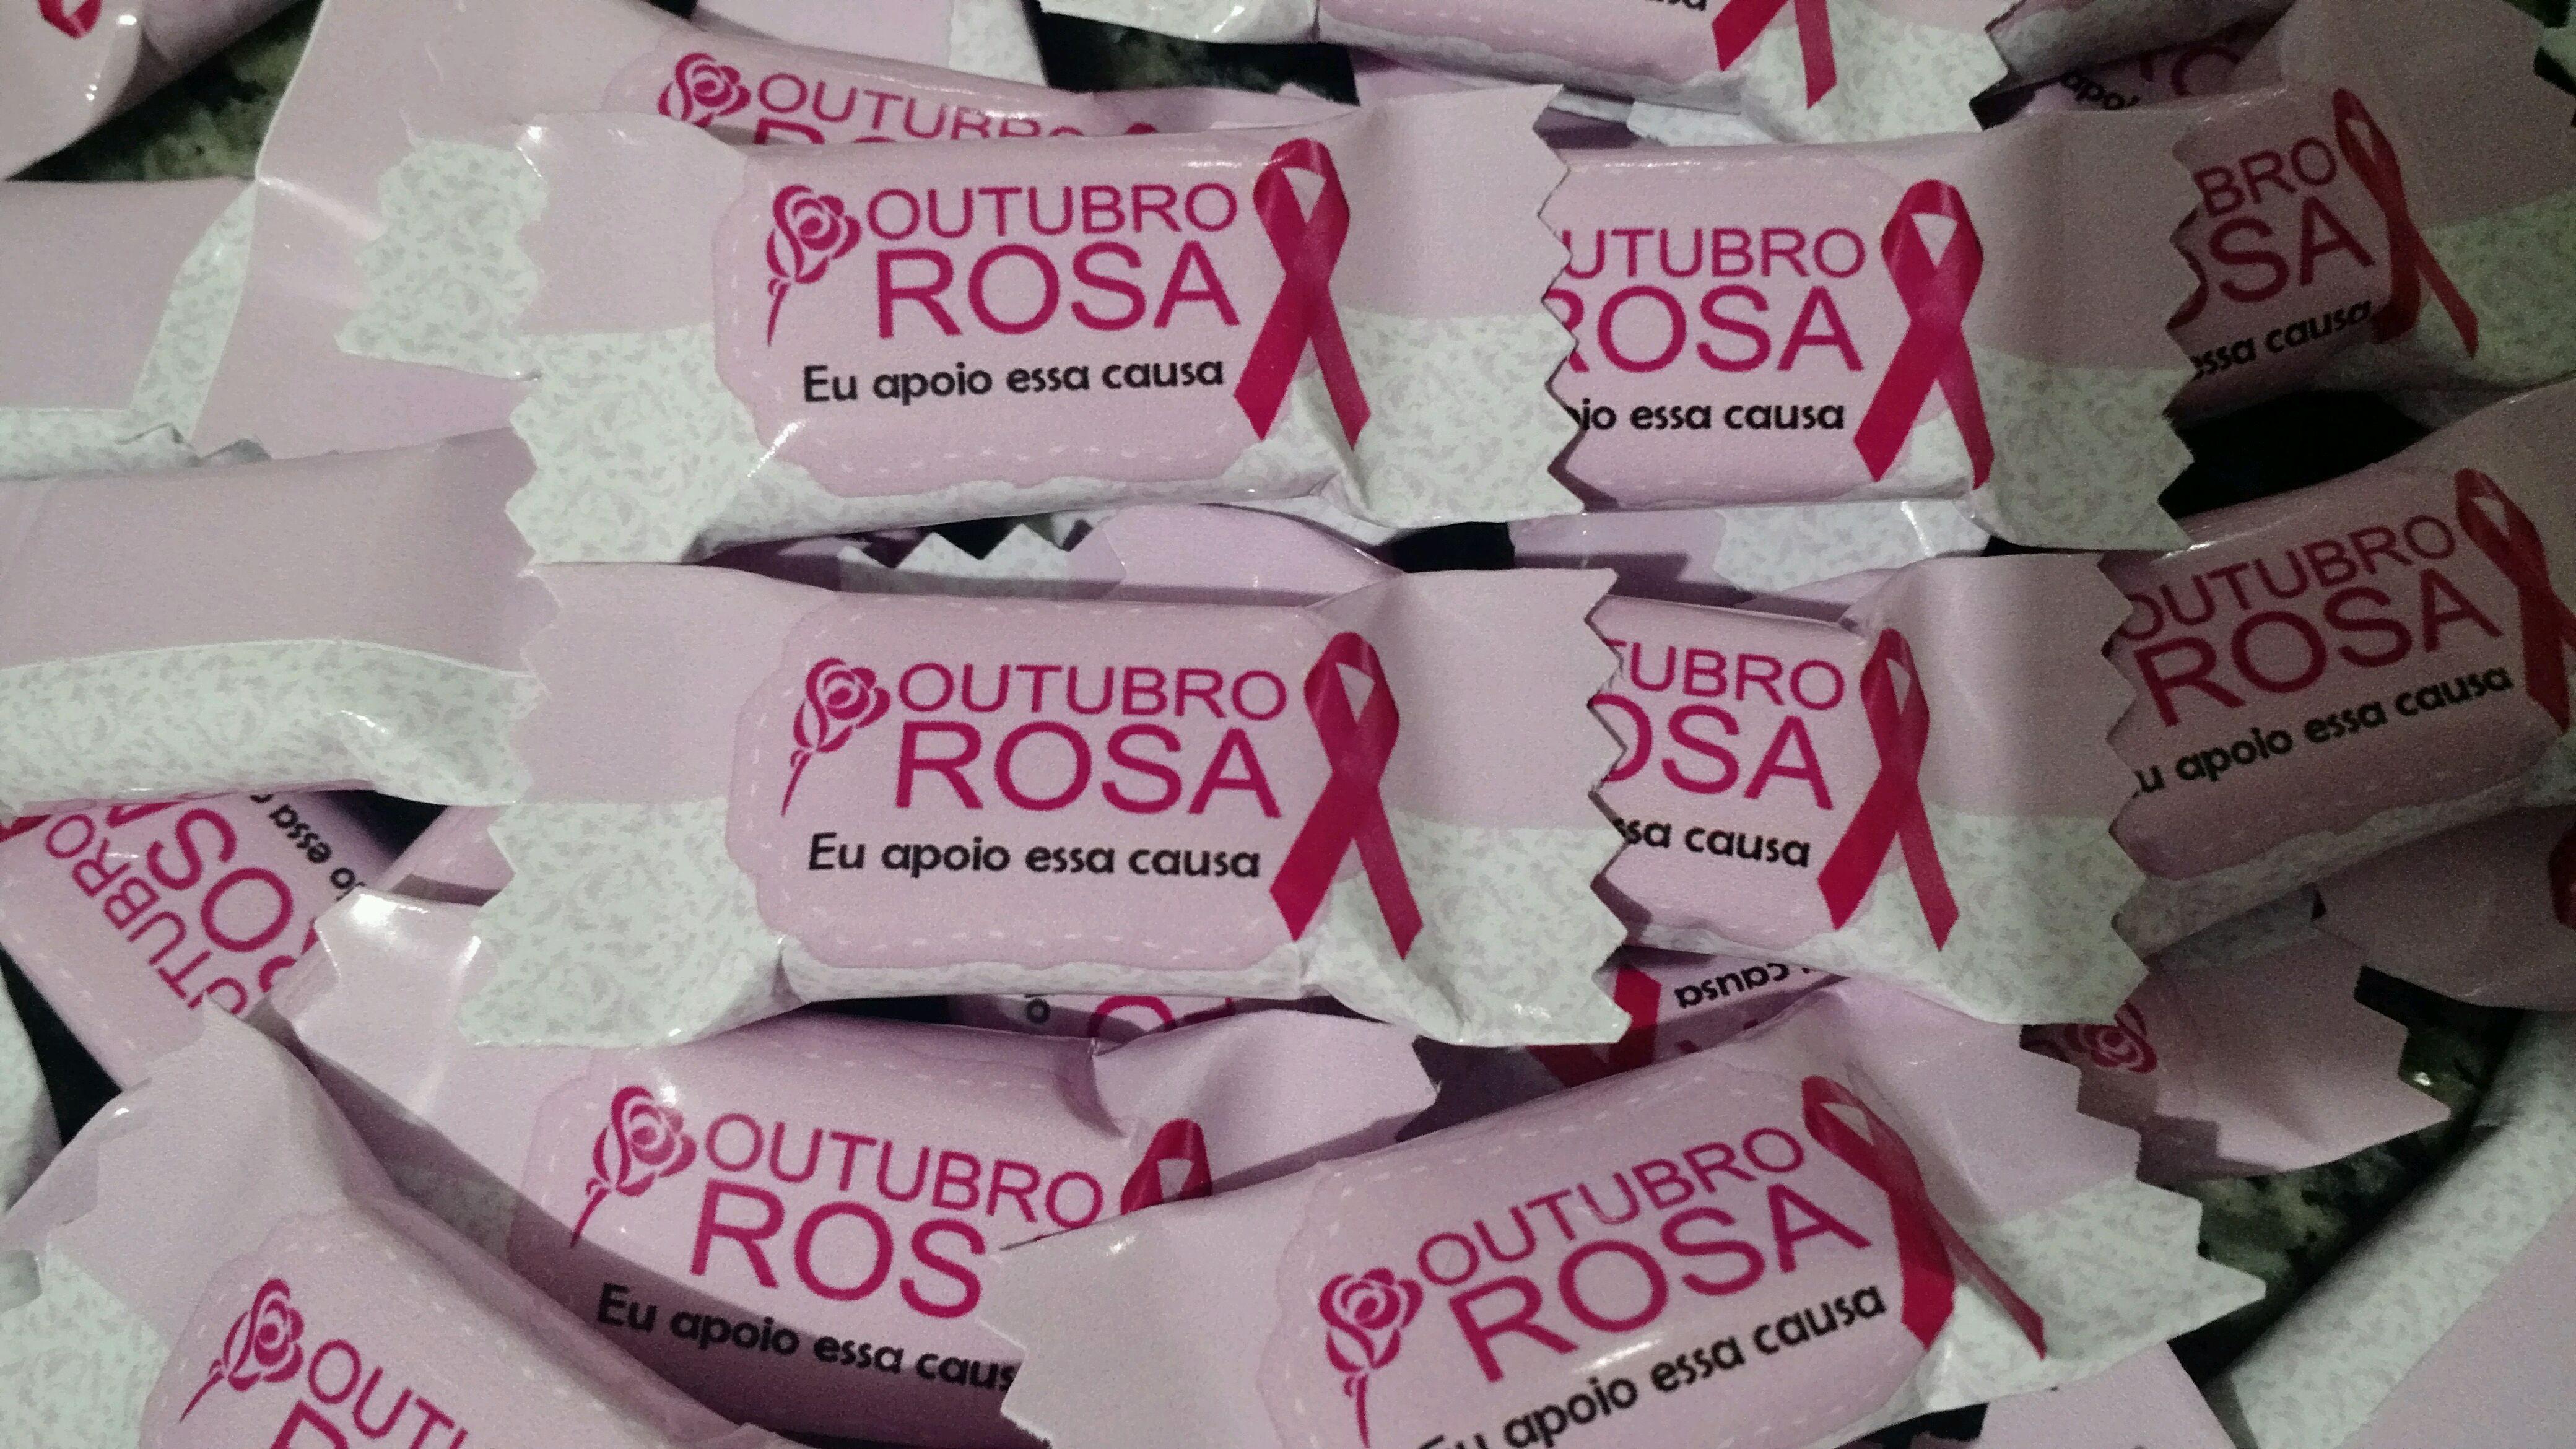 Suficiente Personalizados Outubro Rosa   Elo7 QS59